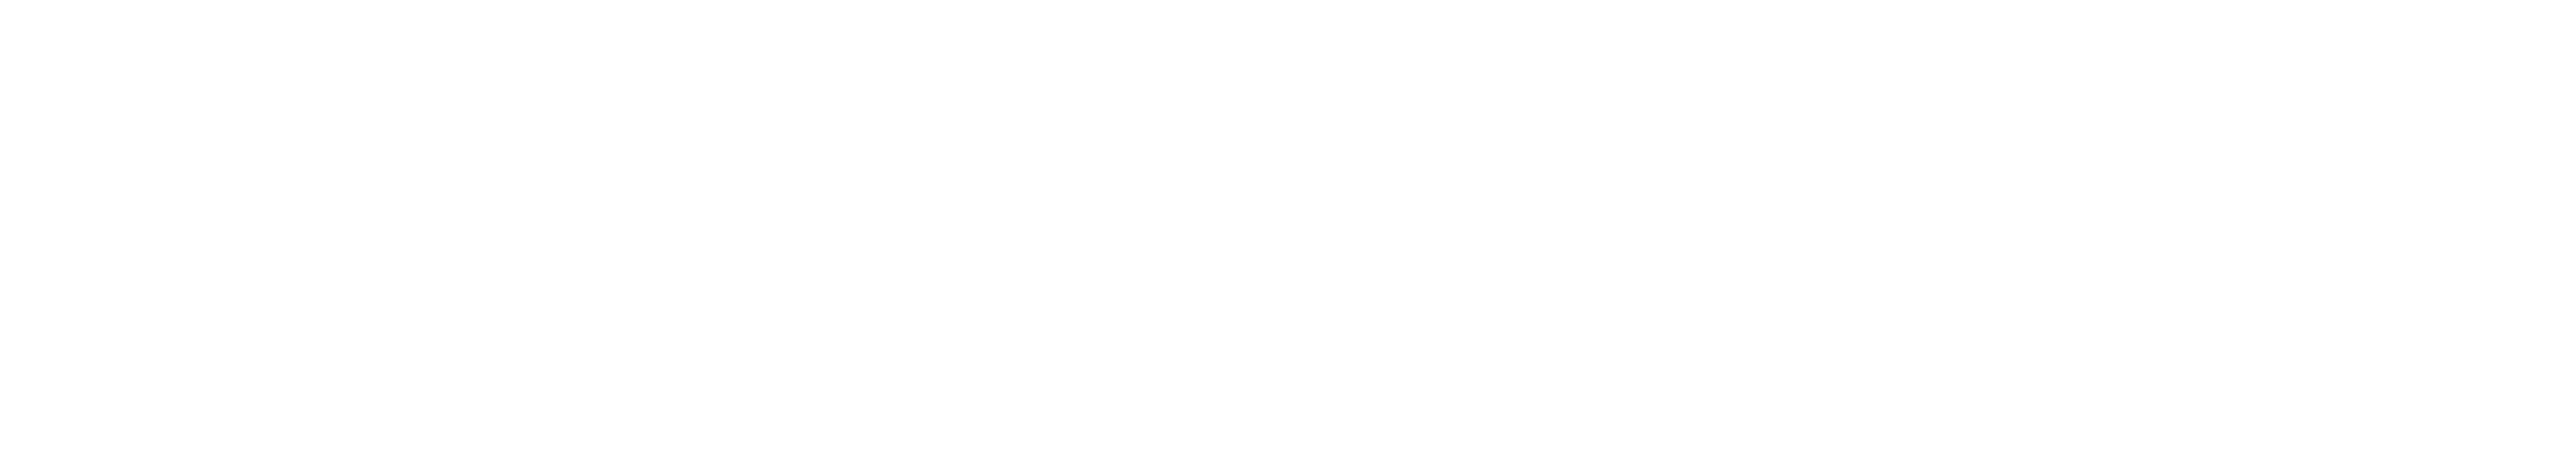 CHESS HEALTH-WHITE-NO TAG